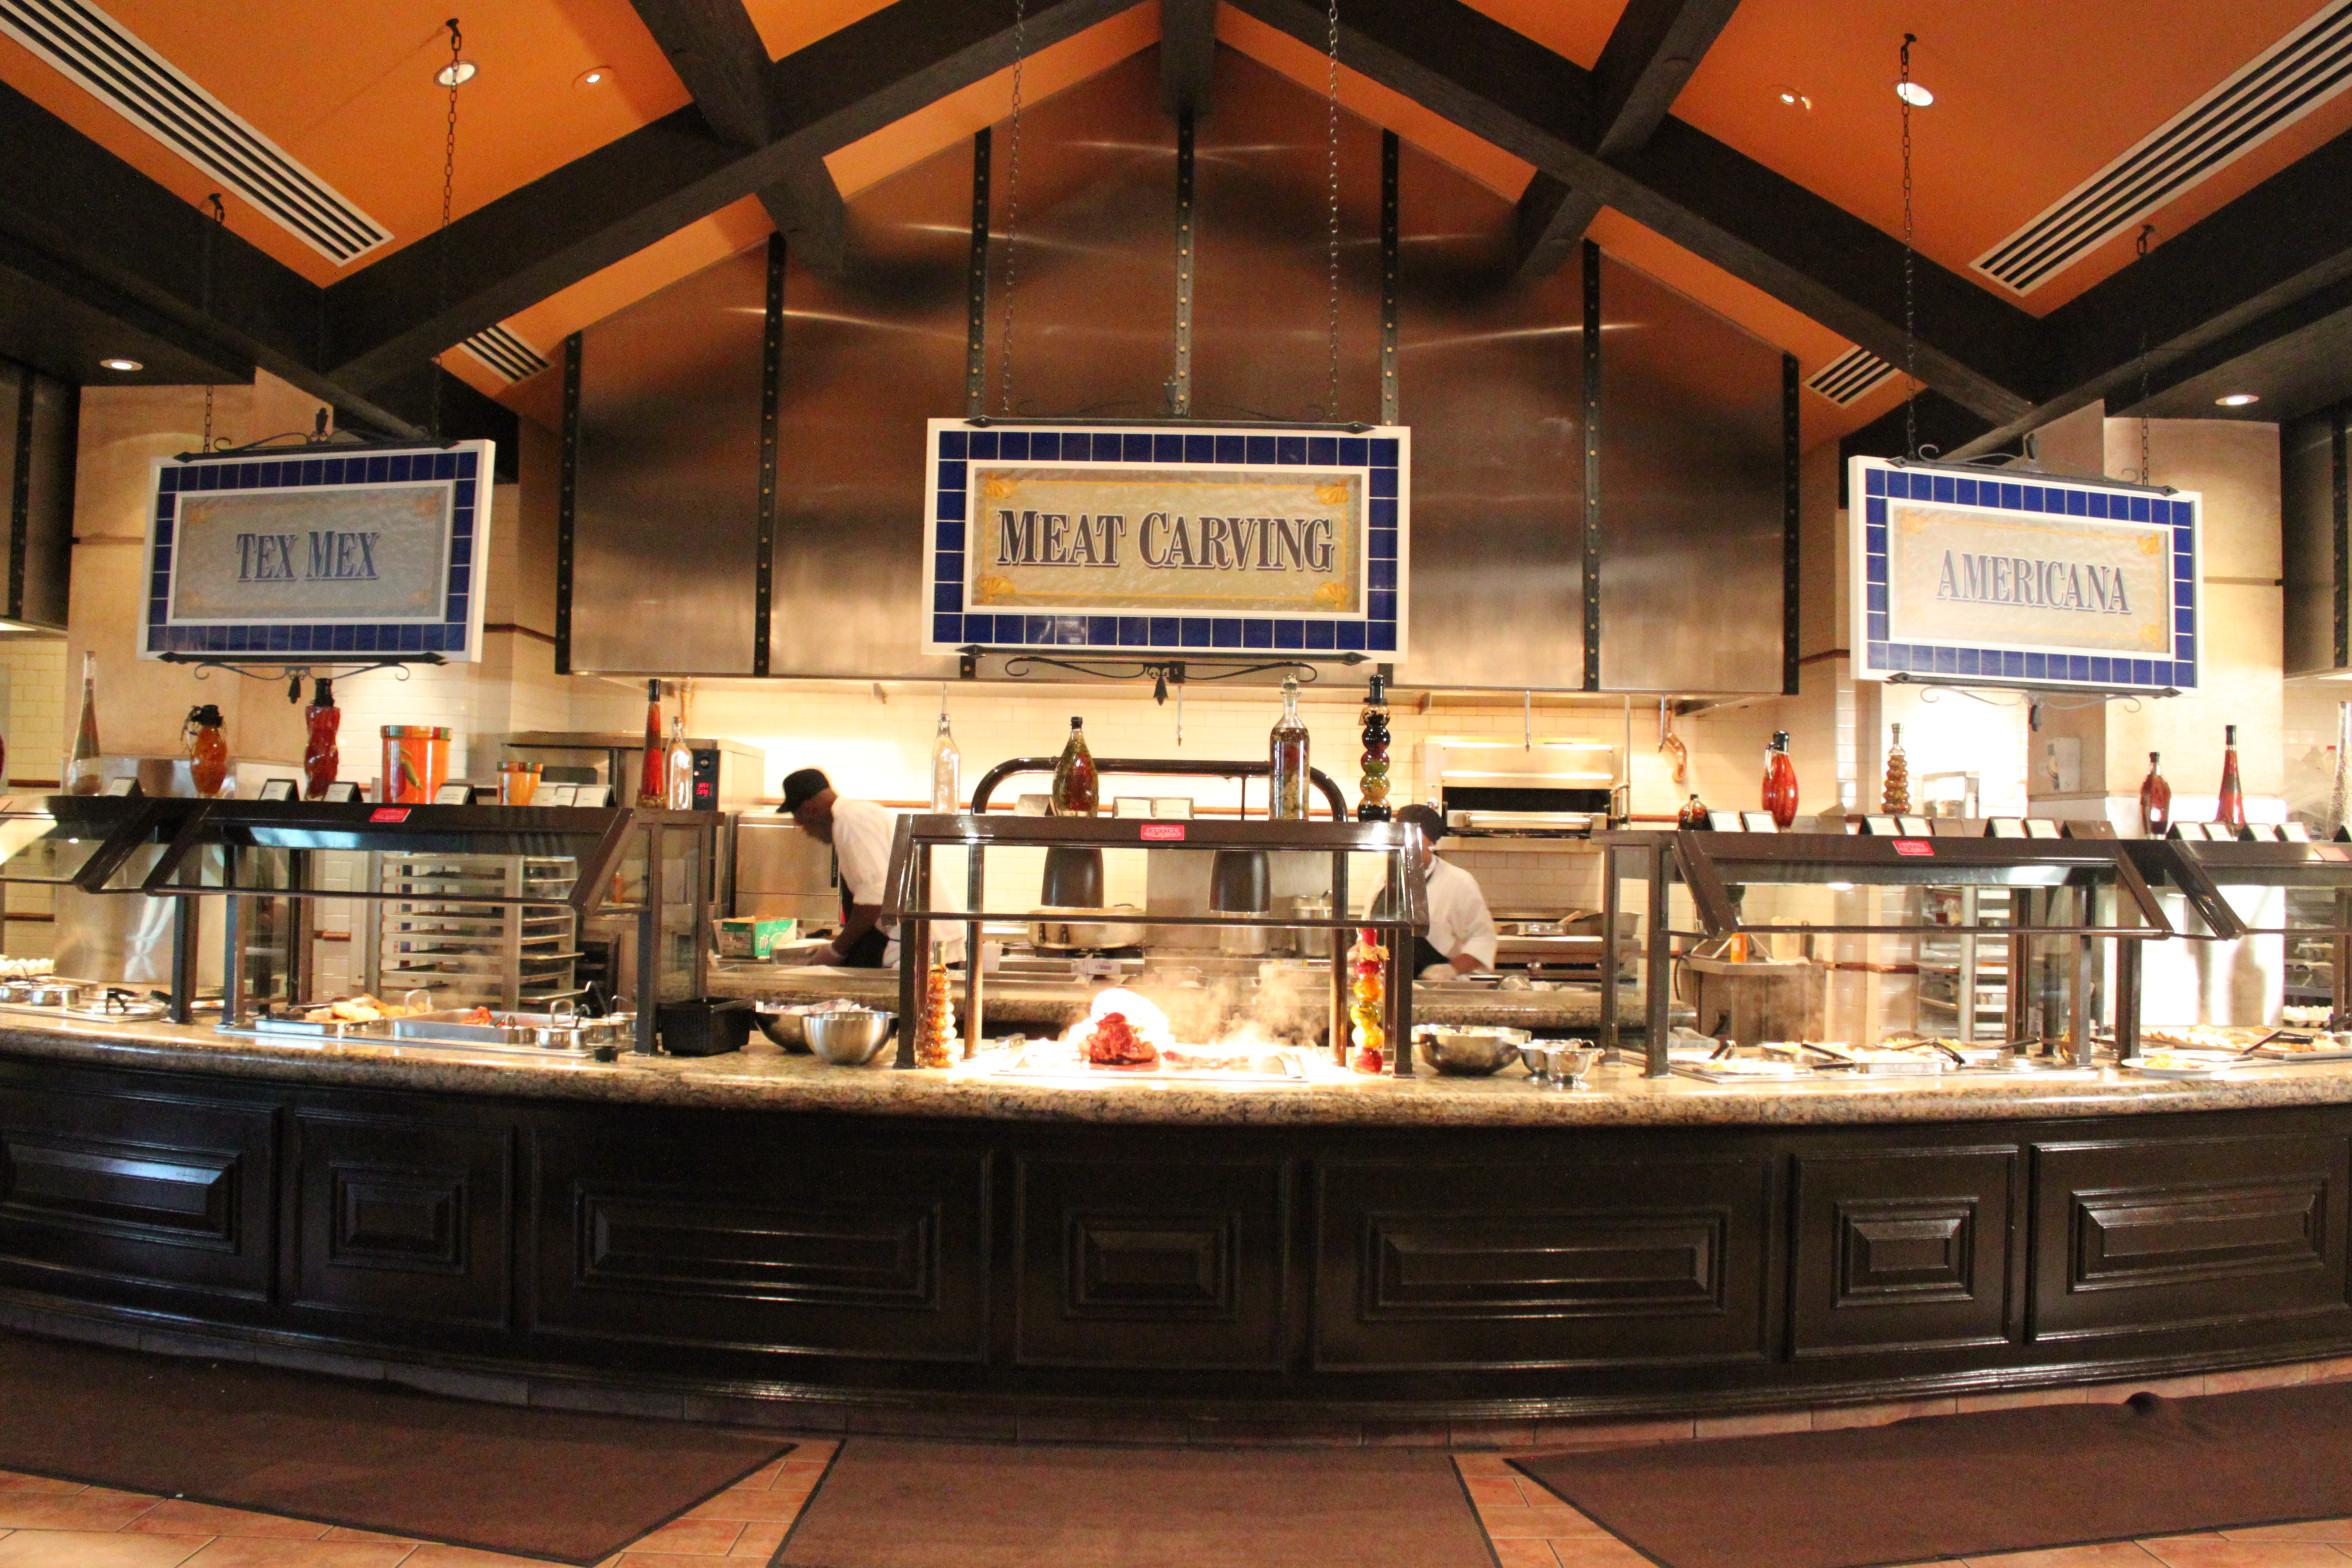 photo release pinnacle entertainment to honor veterans and rh globenewswire com ameristar st charles buffet crab leg night ameristar st charles seafood buffet